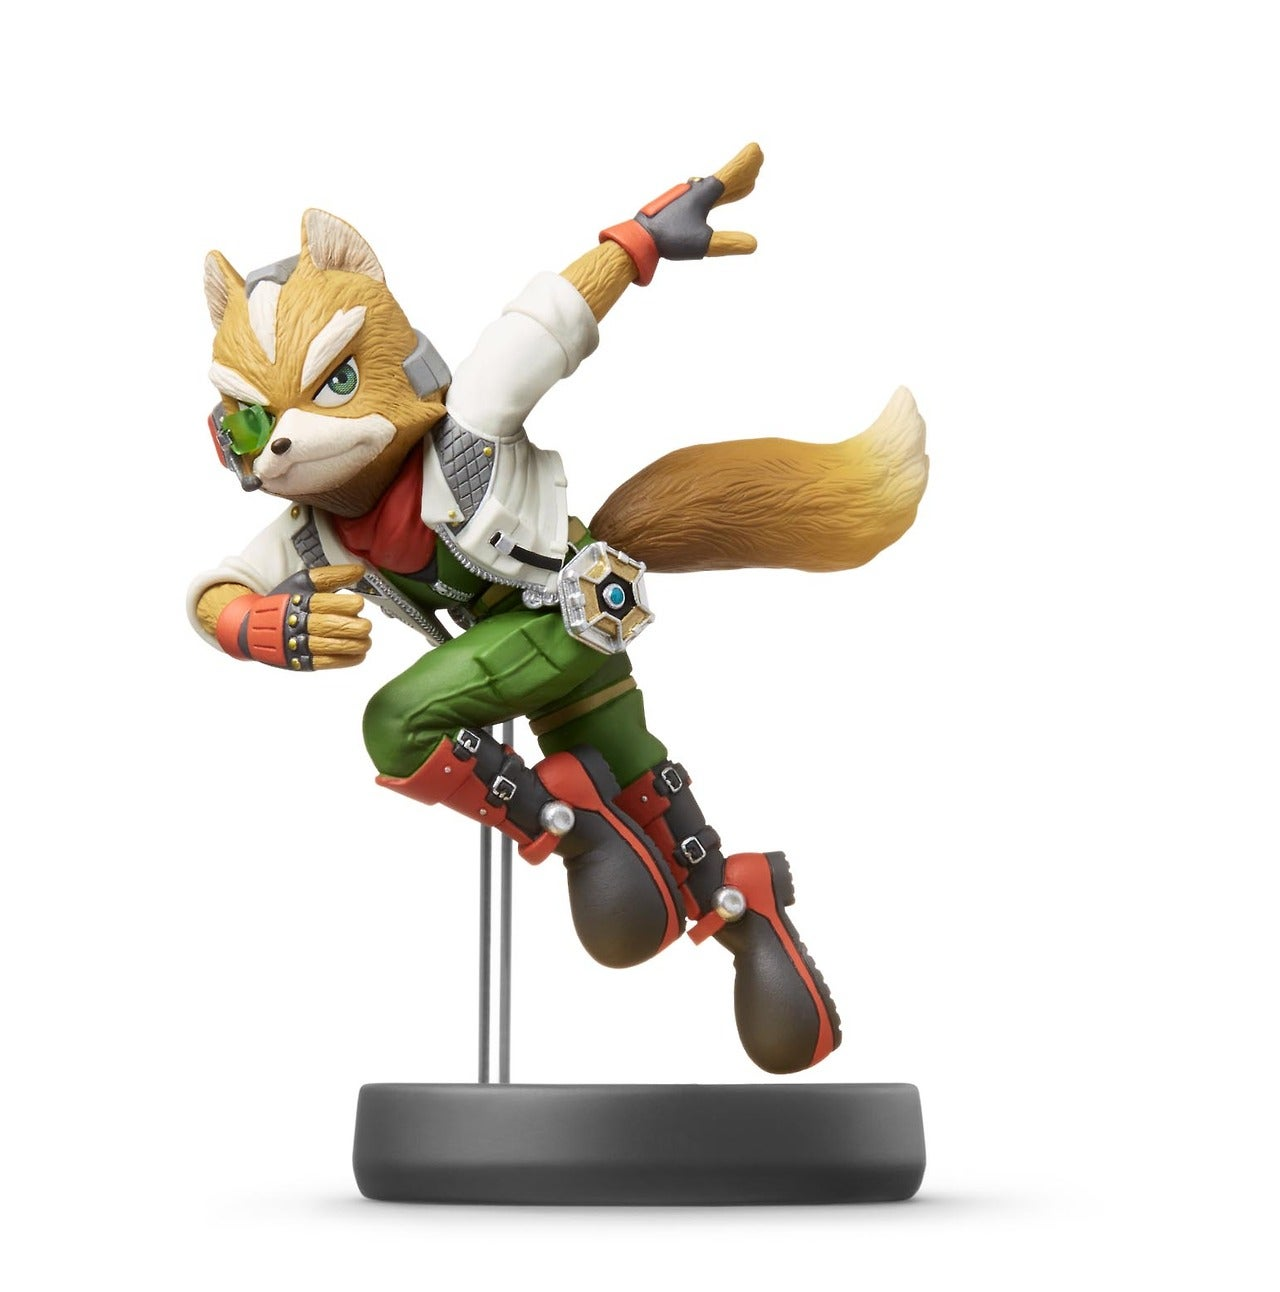 Nintendo's Little Plastic Figures Look Fantastic